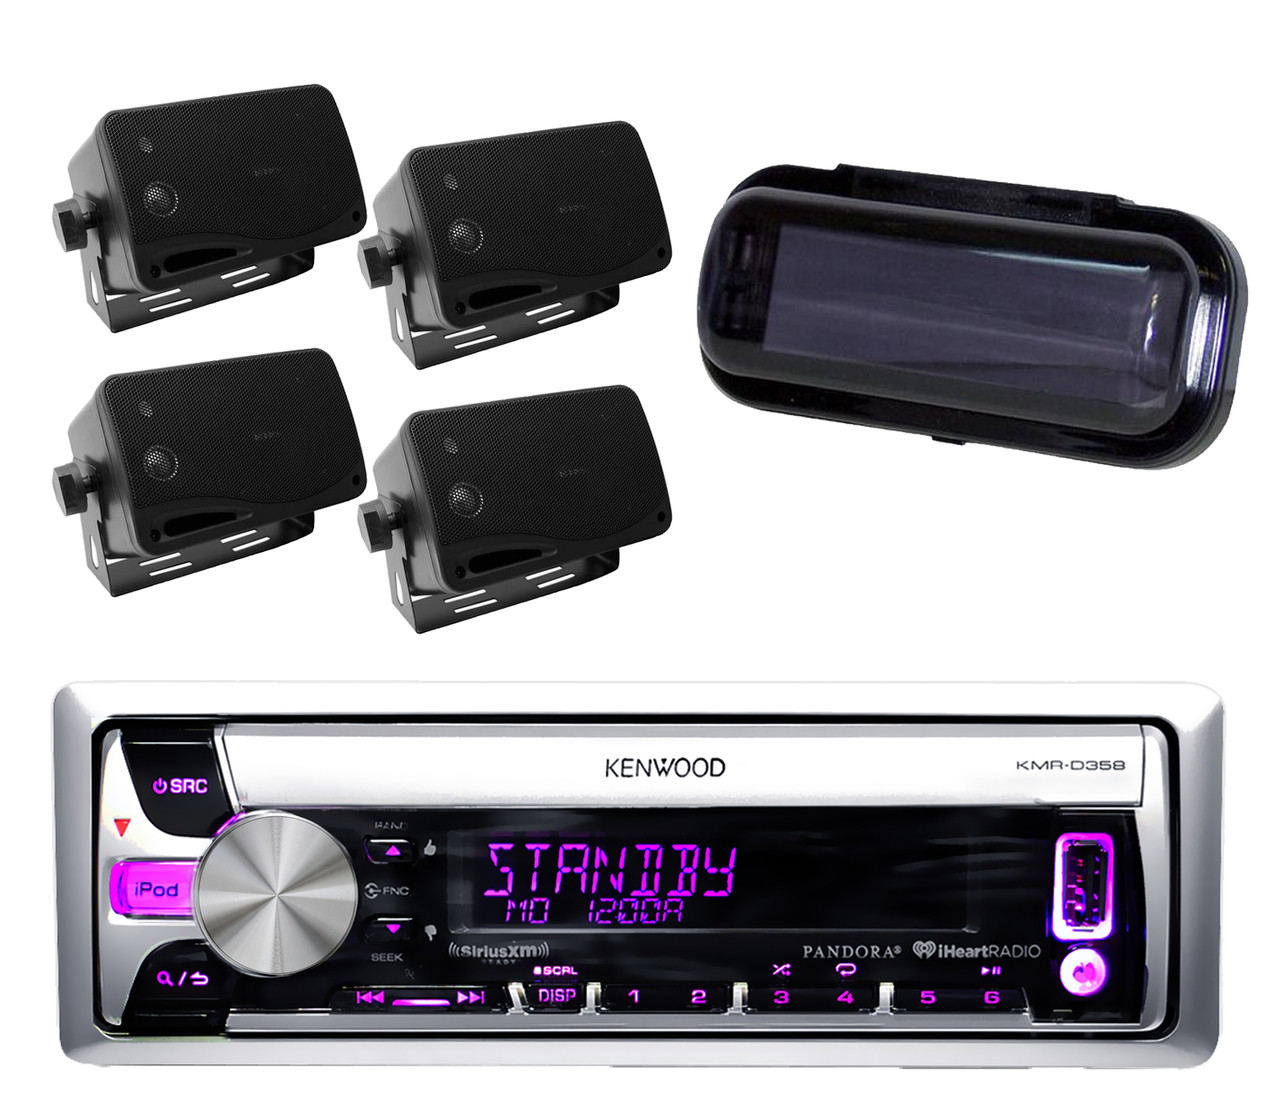 medium resolution of kenwood new kmr d358 iphone ipod pandora radio player 4 black box ouku wiring harness kenwood kmr d358 wiring harness